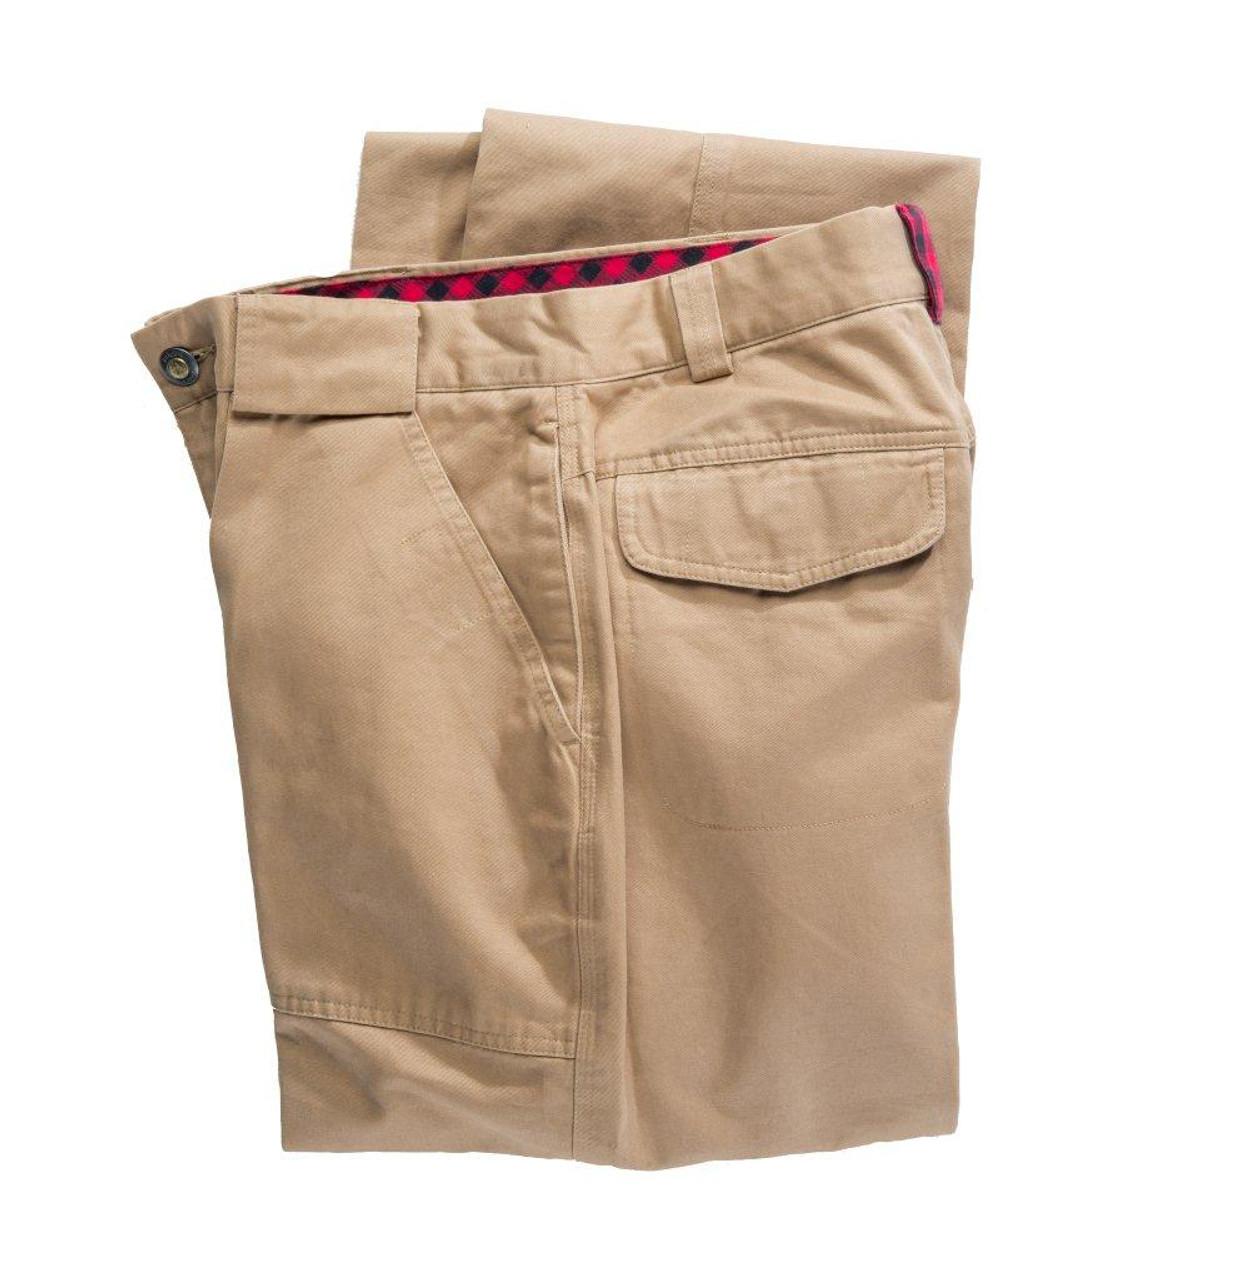 Highland Khaki's - Khaki - 30% OFF